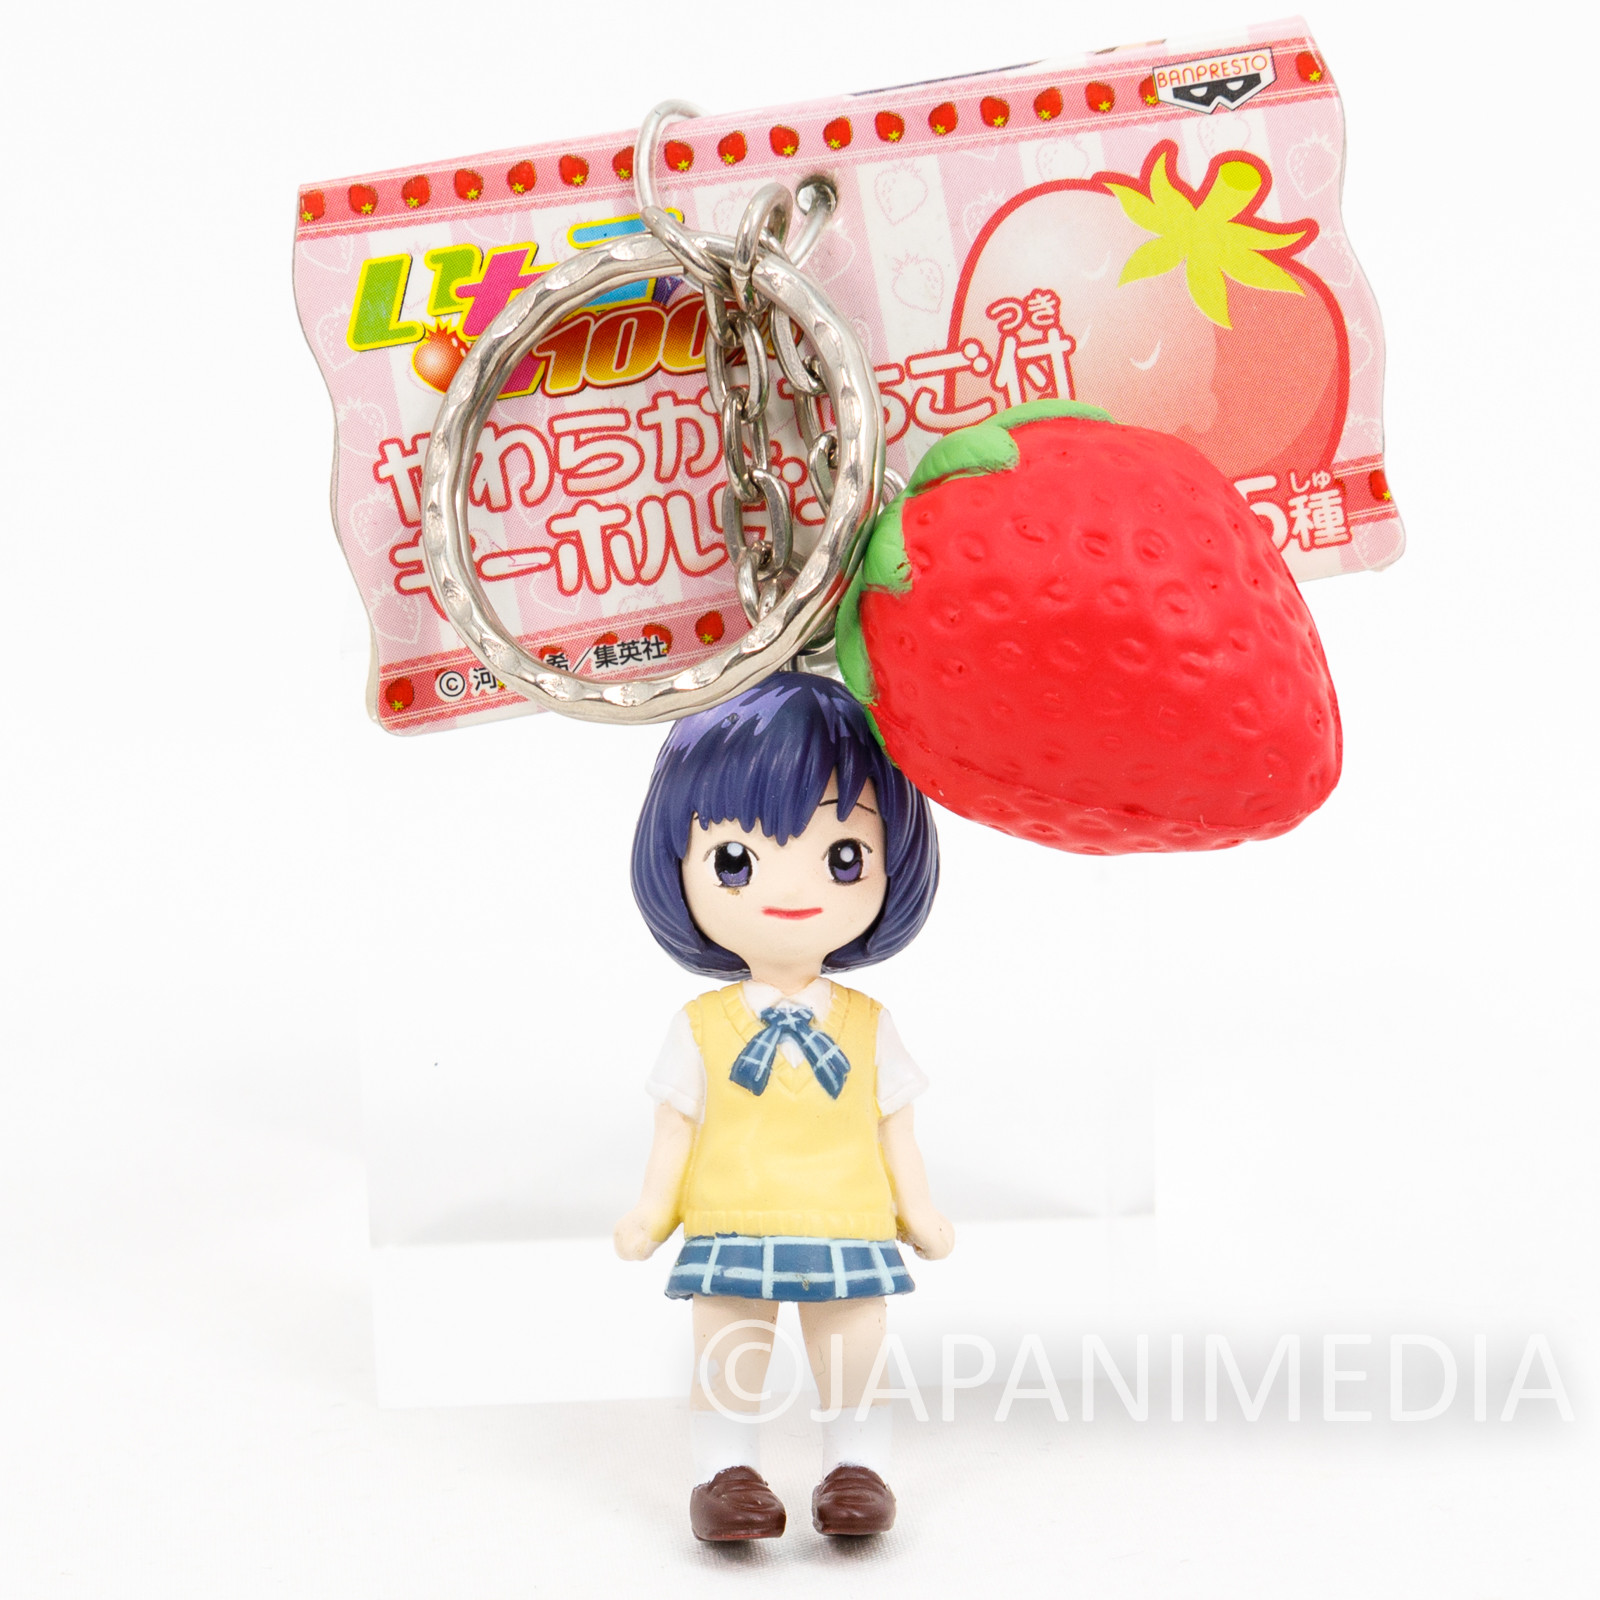 Strawberry Ichigo 100% Yui Minamito Figure Keychain JAPAN ANIME MANGA